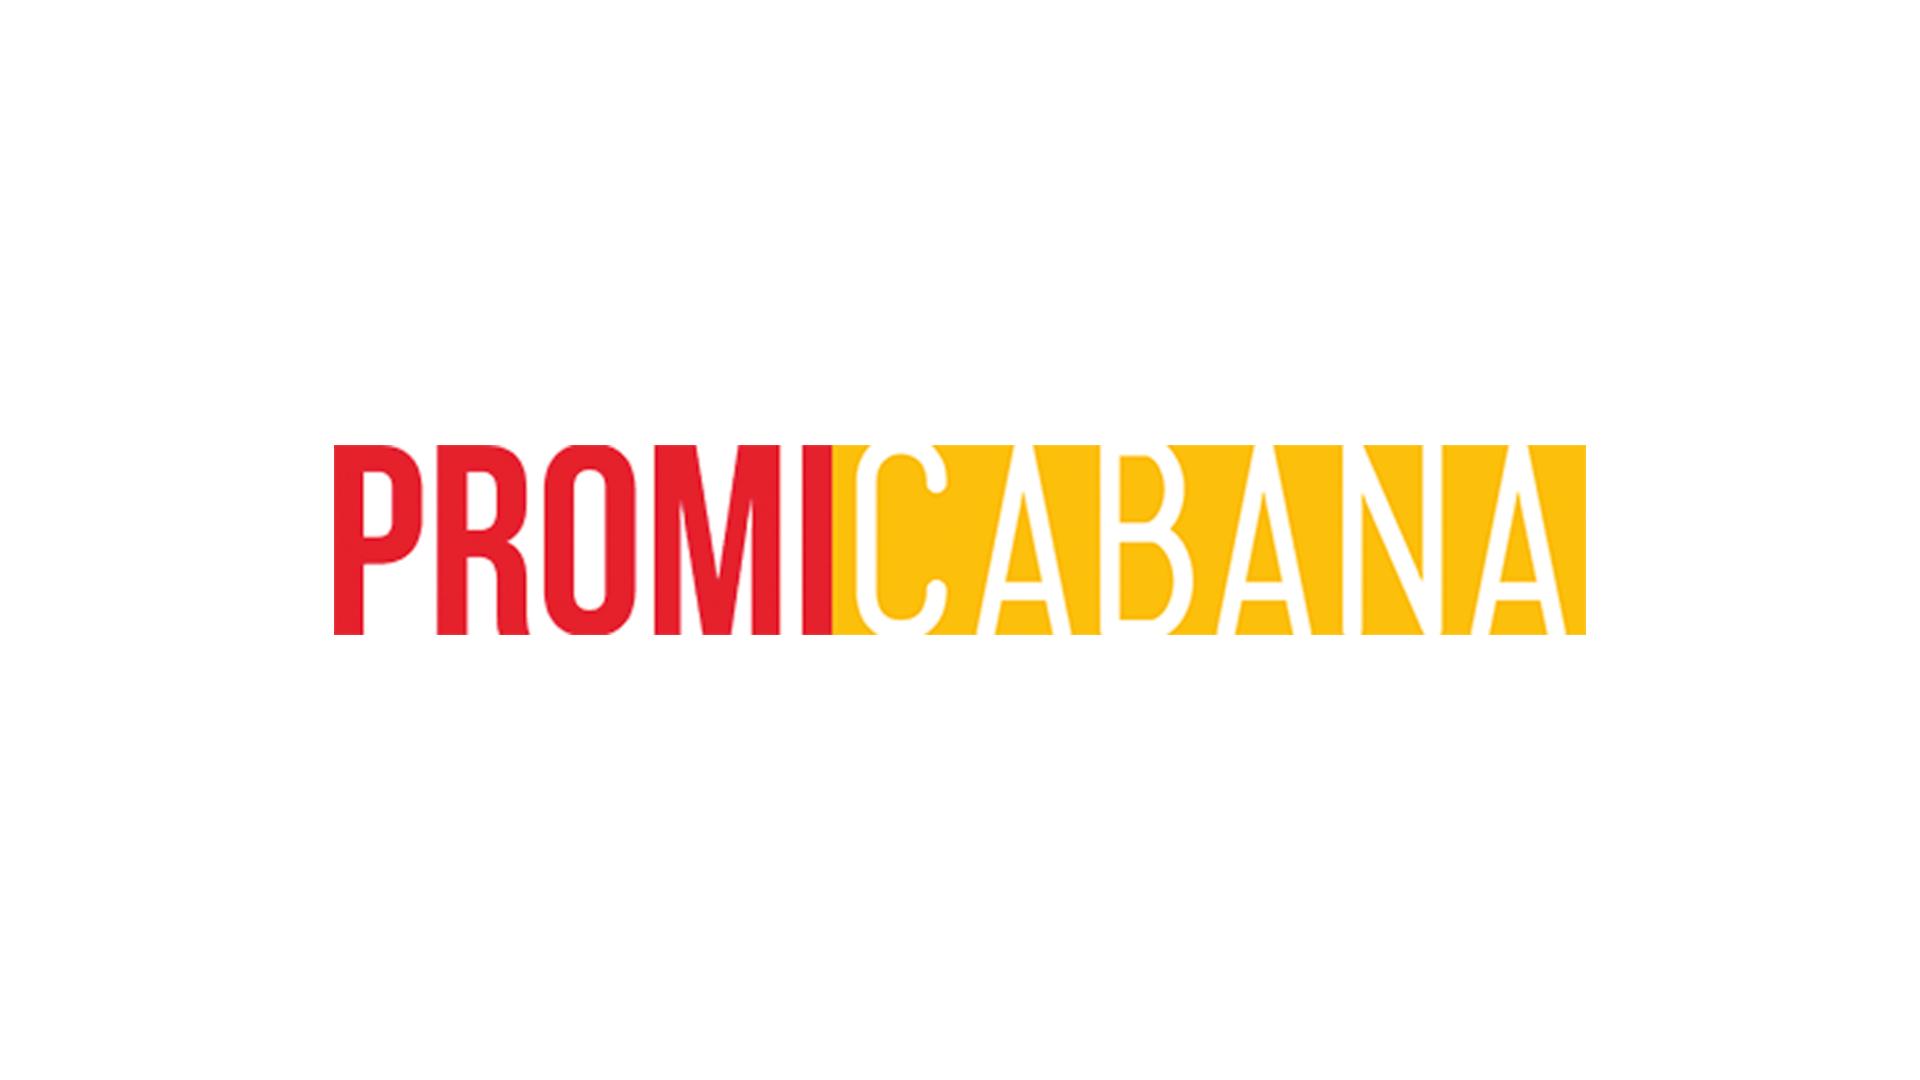 Josh-Hutcherson-Claudia-Traisac-Escobar-Paradise-Lost-Trailer